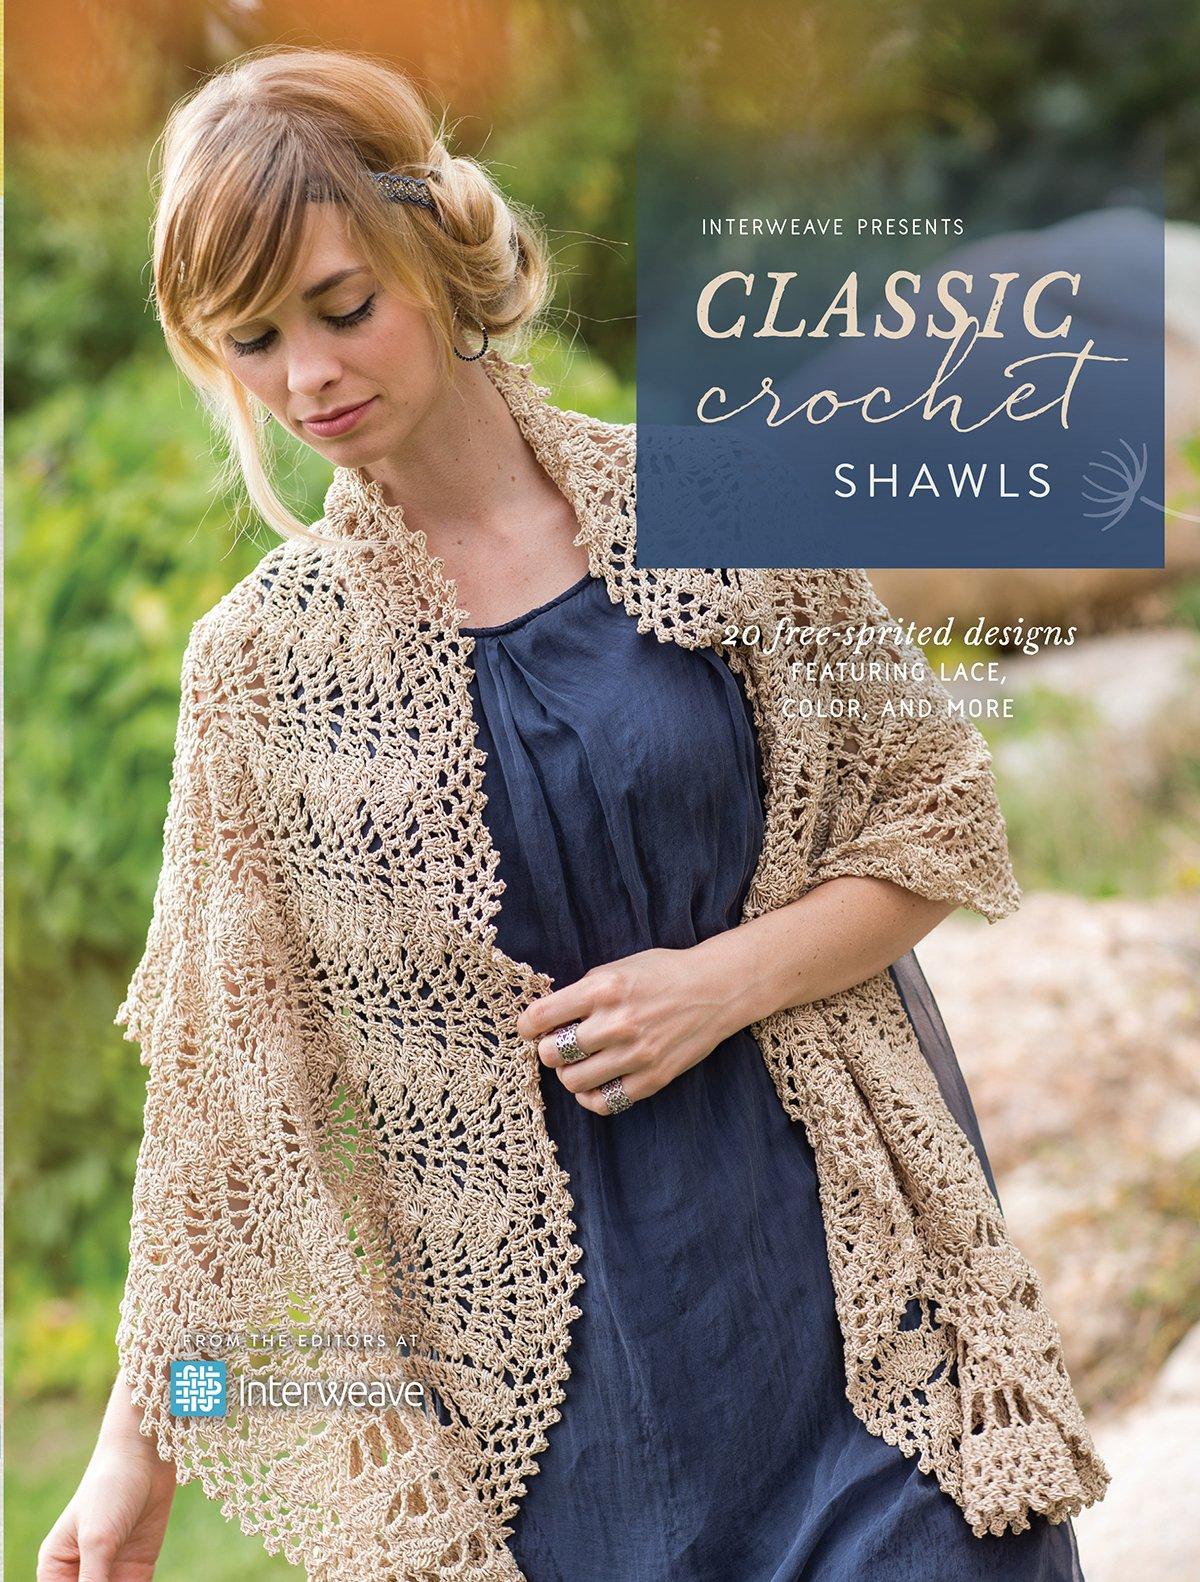 Interweave Presents Classic Crochet Shawls 20 Free Spirited Designs